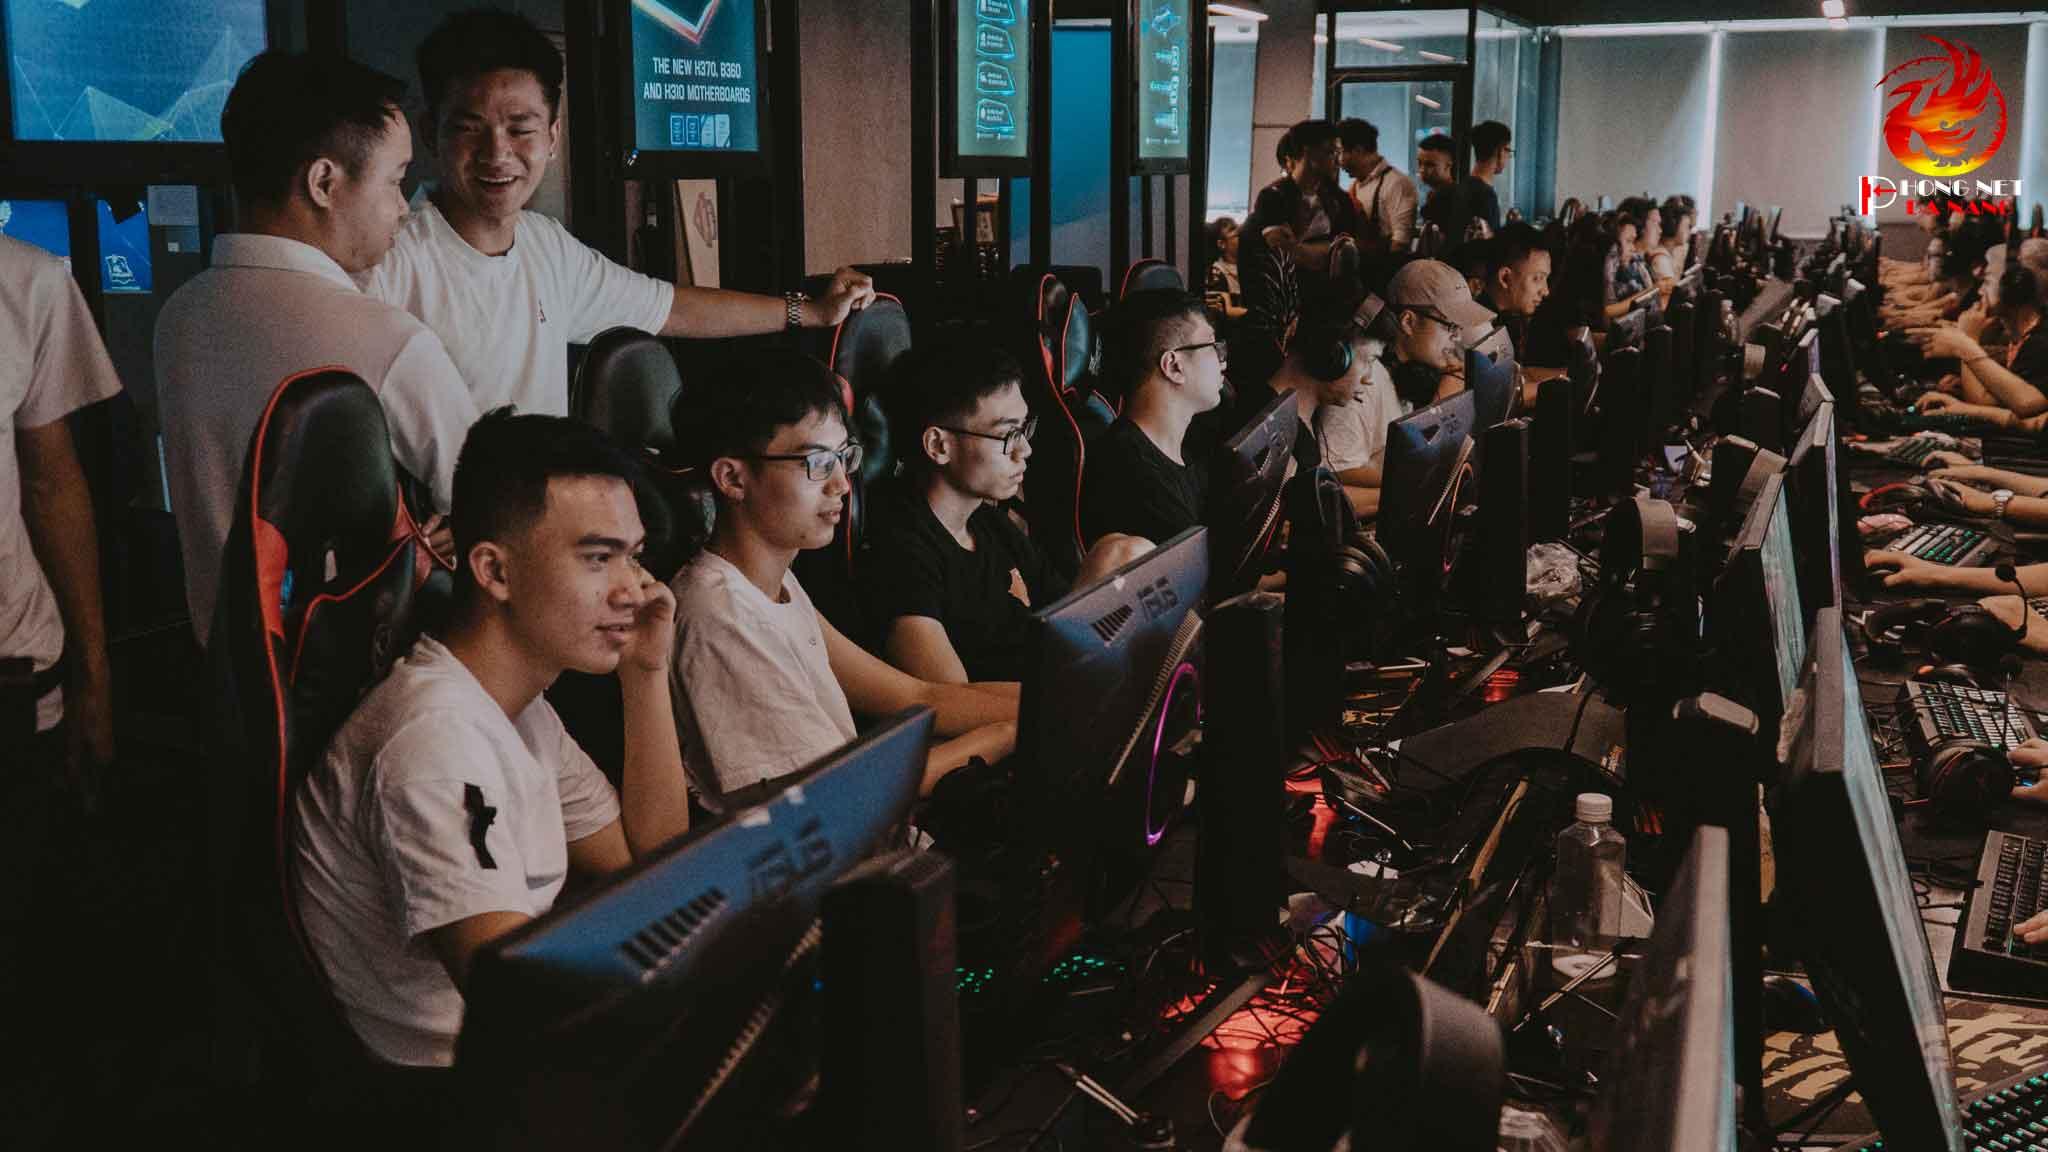 lap-dat-phong-game-net-50-may-tai-thanh-pho-da-nang-phongnetdanang.com-6